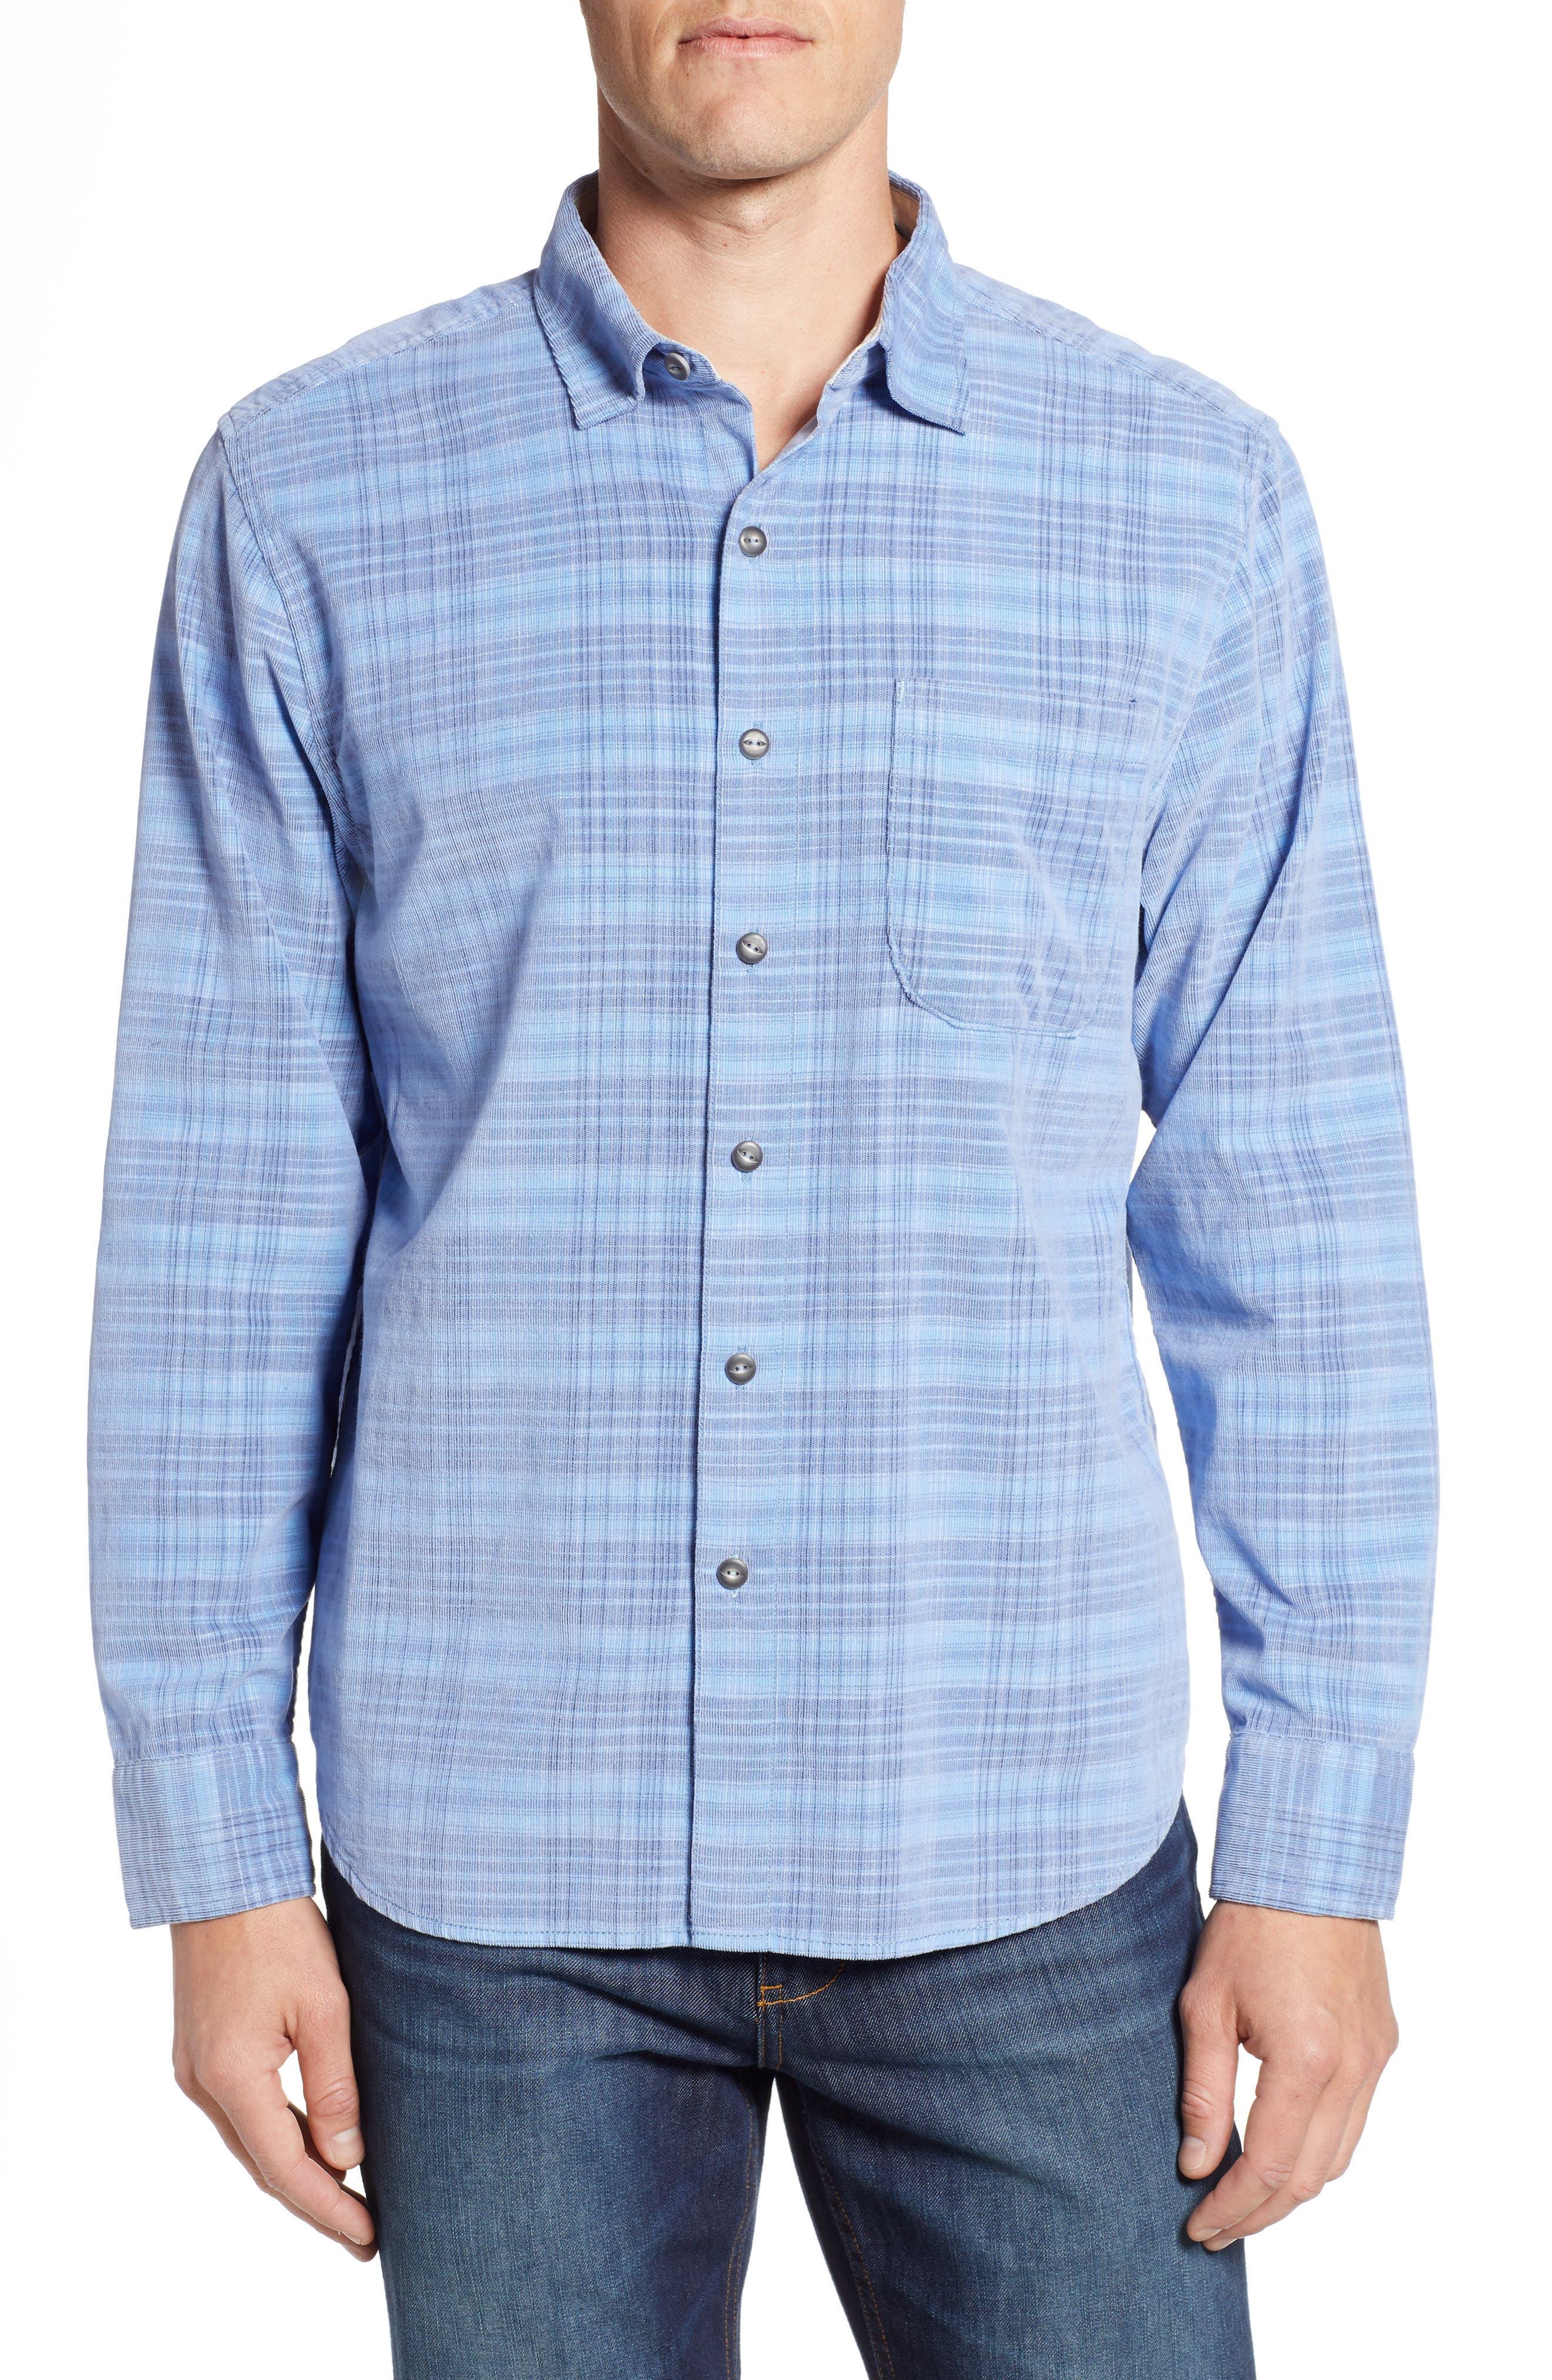 Cruzy Plaid Corduroy Sport Shirt,                             Main thumbnail 1, color,                             RIVIERA AZURE